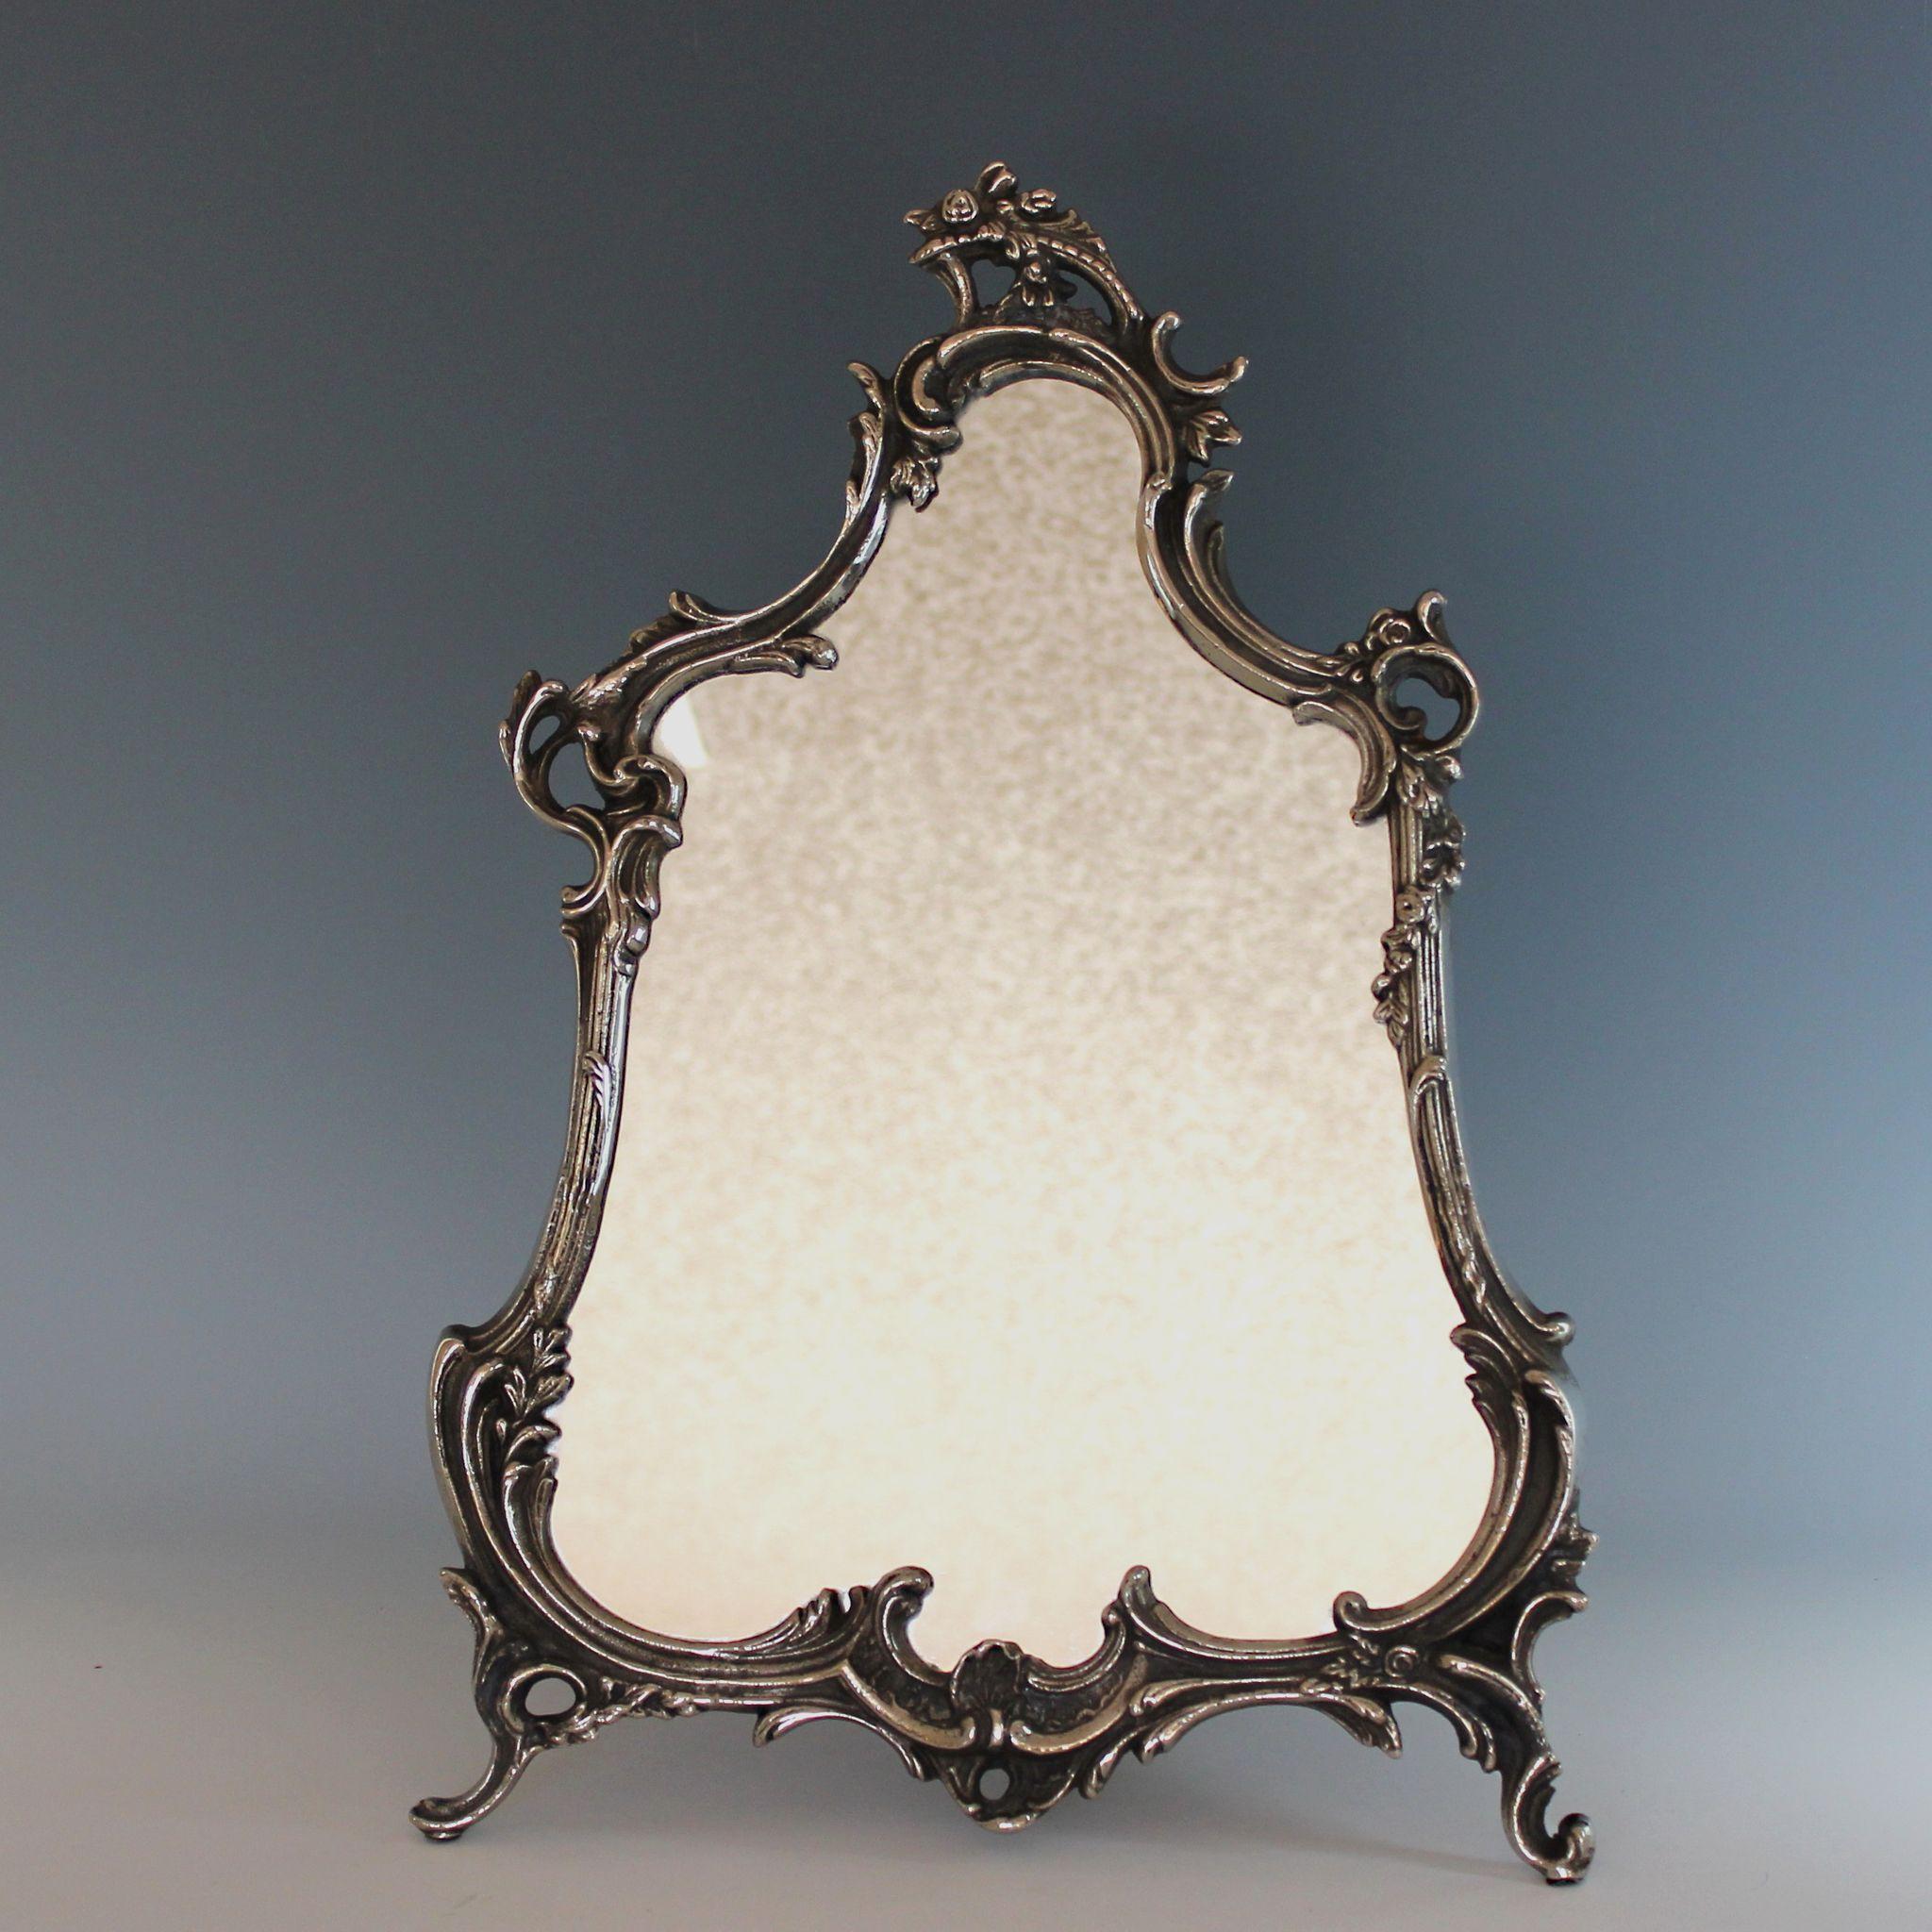 Old fashioned vanity mirror 59